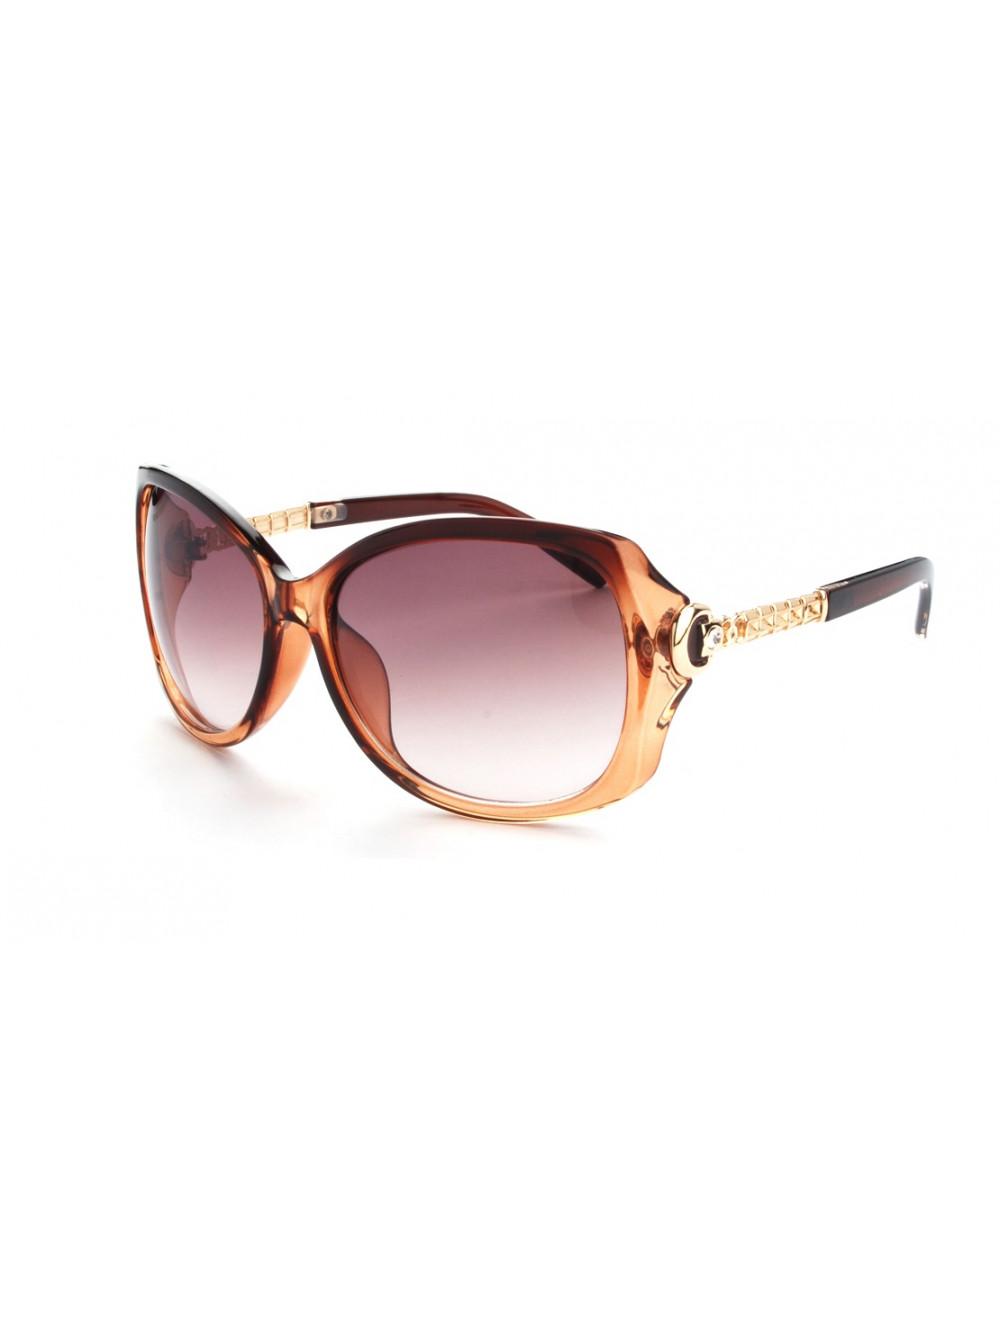 Slnečné okuliare Diana Brunette